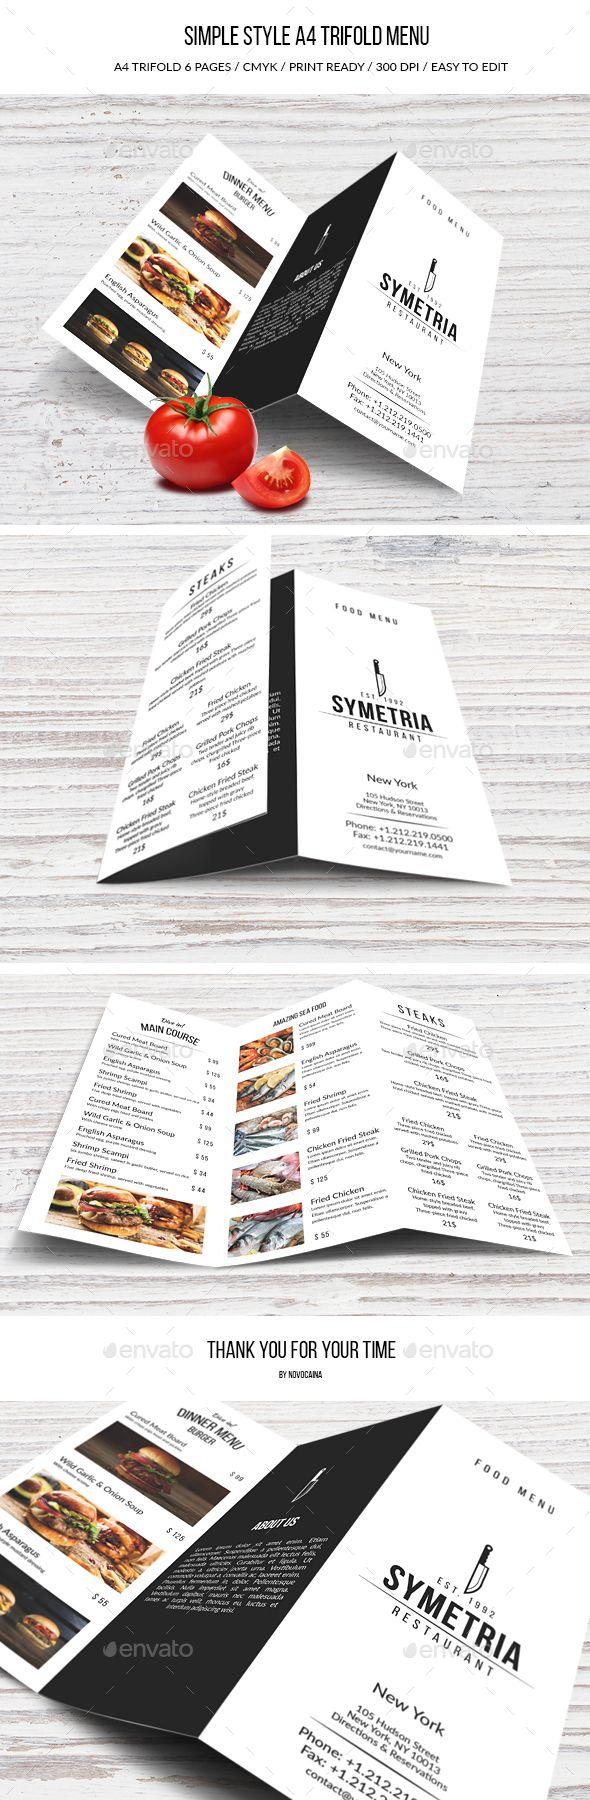 Best 25+ Menu design templates ideas on Pinterest | Menu design ...